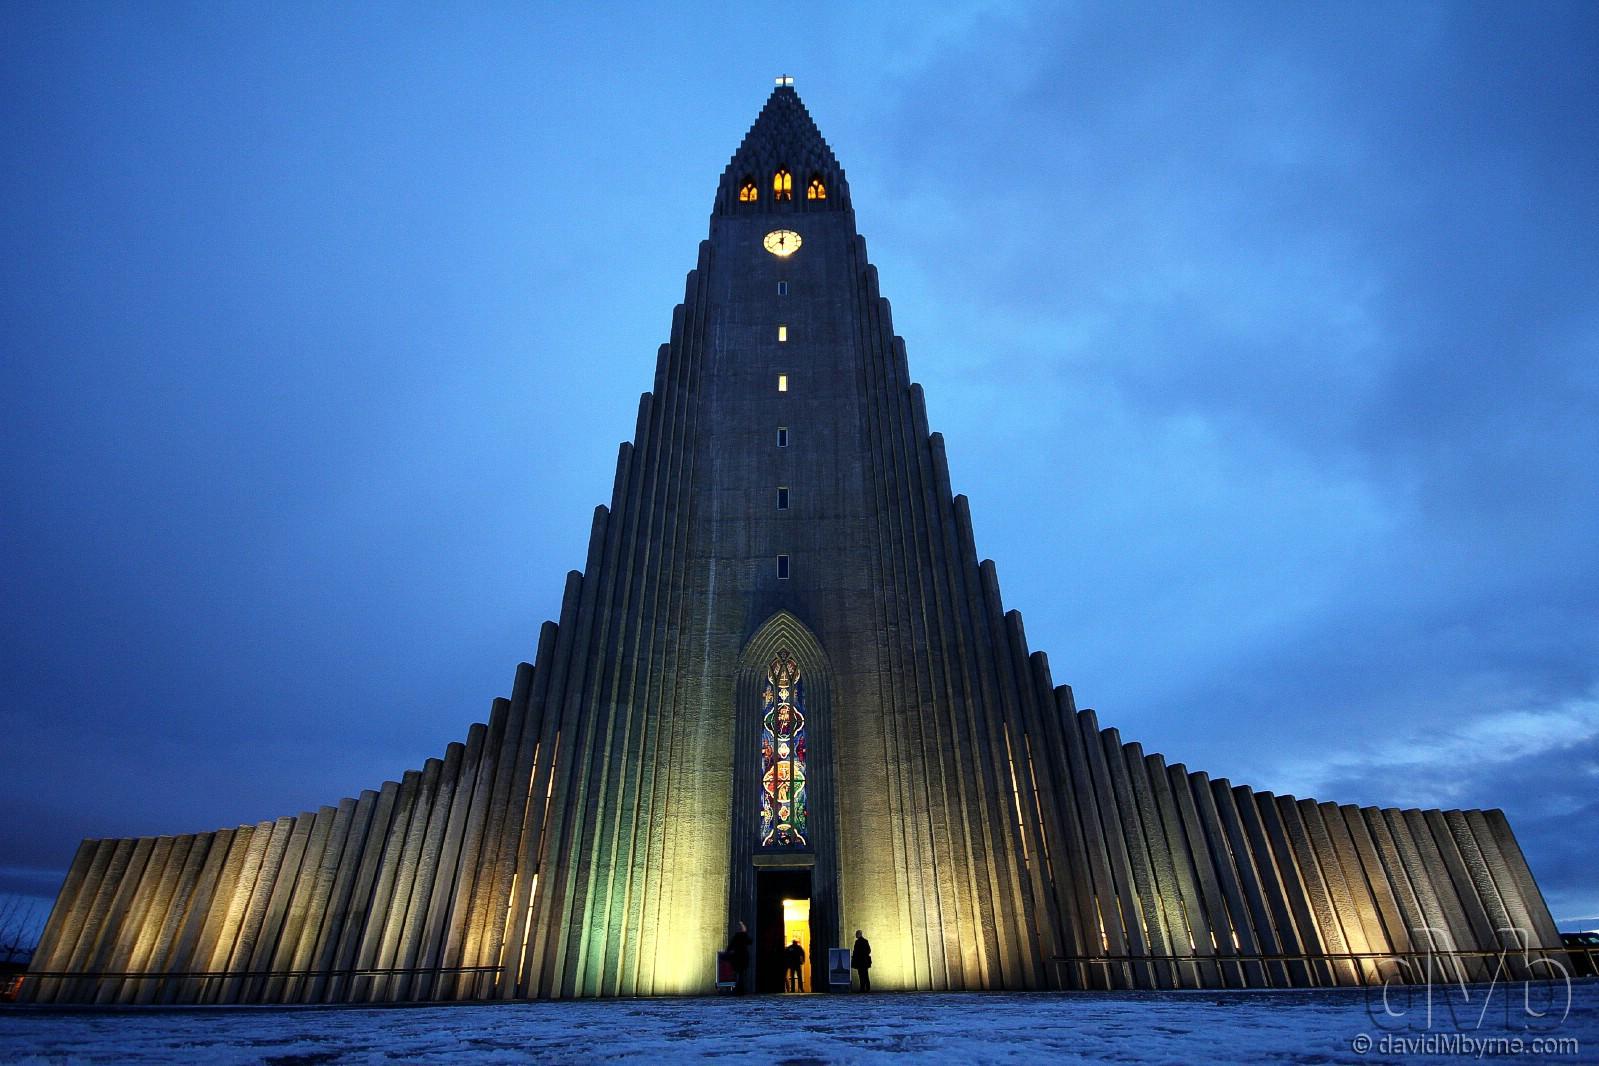 Hallgrímskirkja (Lutheran church) in Reykjavík, Iceland. December 2nd, 2012 (EOS 60D || Sigma 10-20mm || 10mm, 1/5sec, f/5.9, iso640)